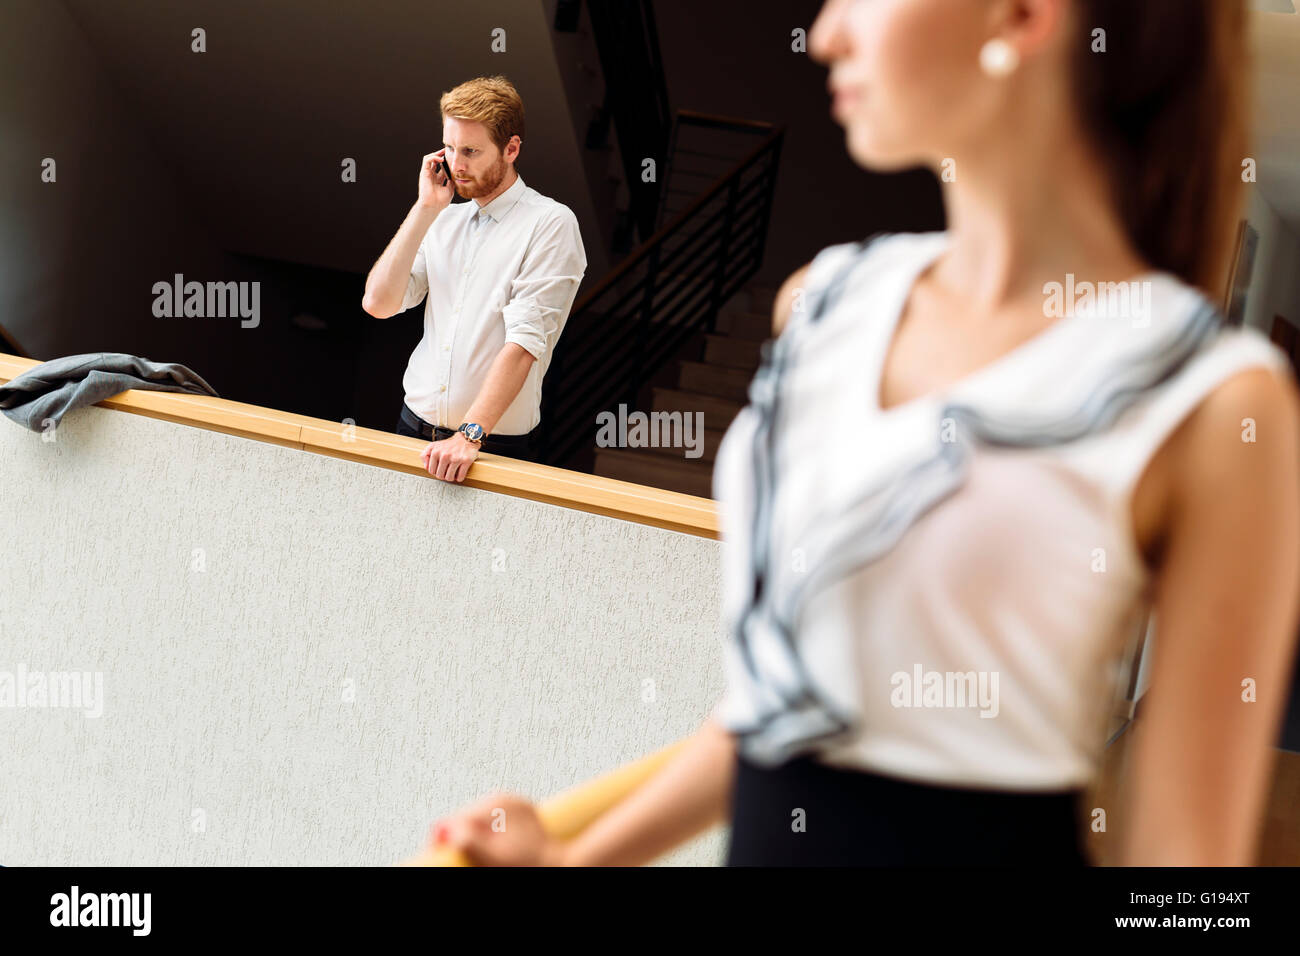 Businessman using phone while having a break - Stock Image